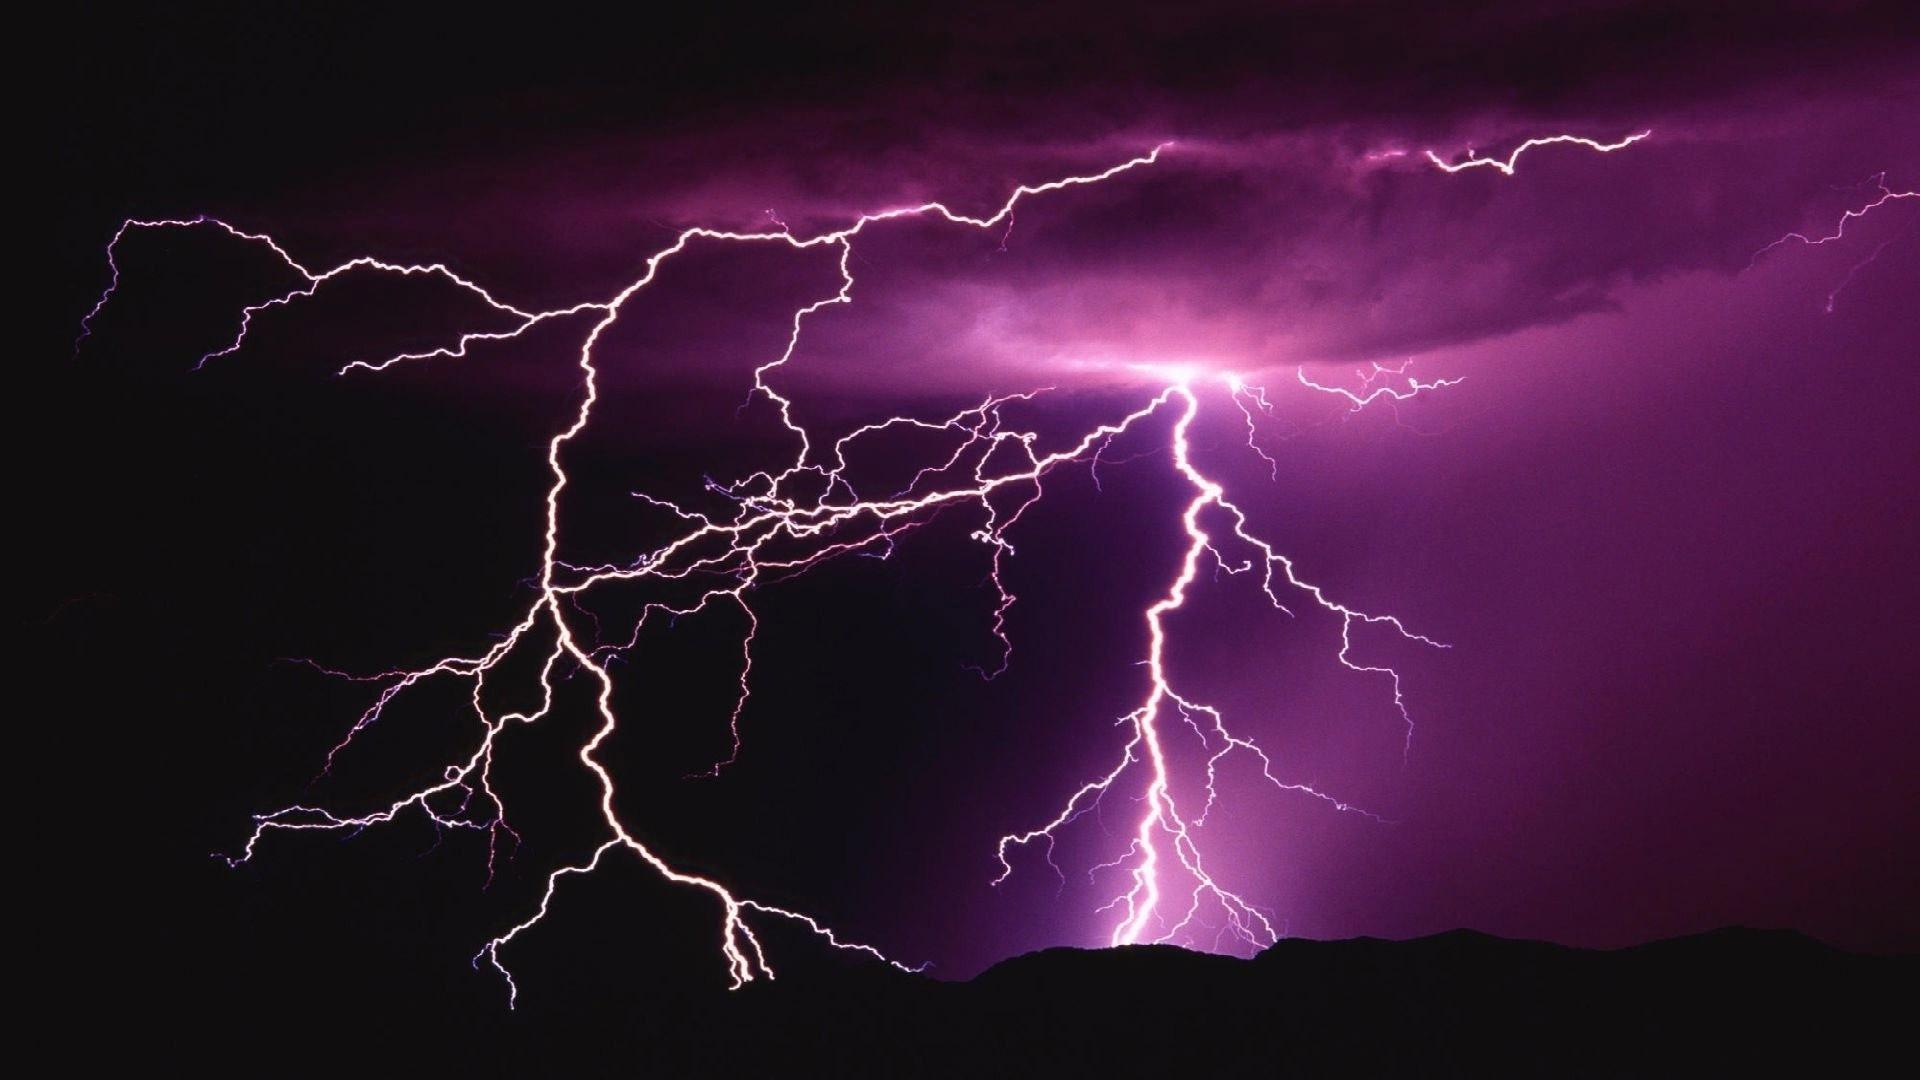 Res: 1920x1080, HD Lightning Storm Image.